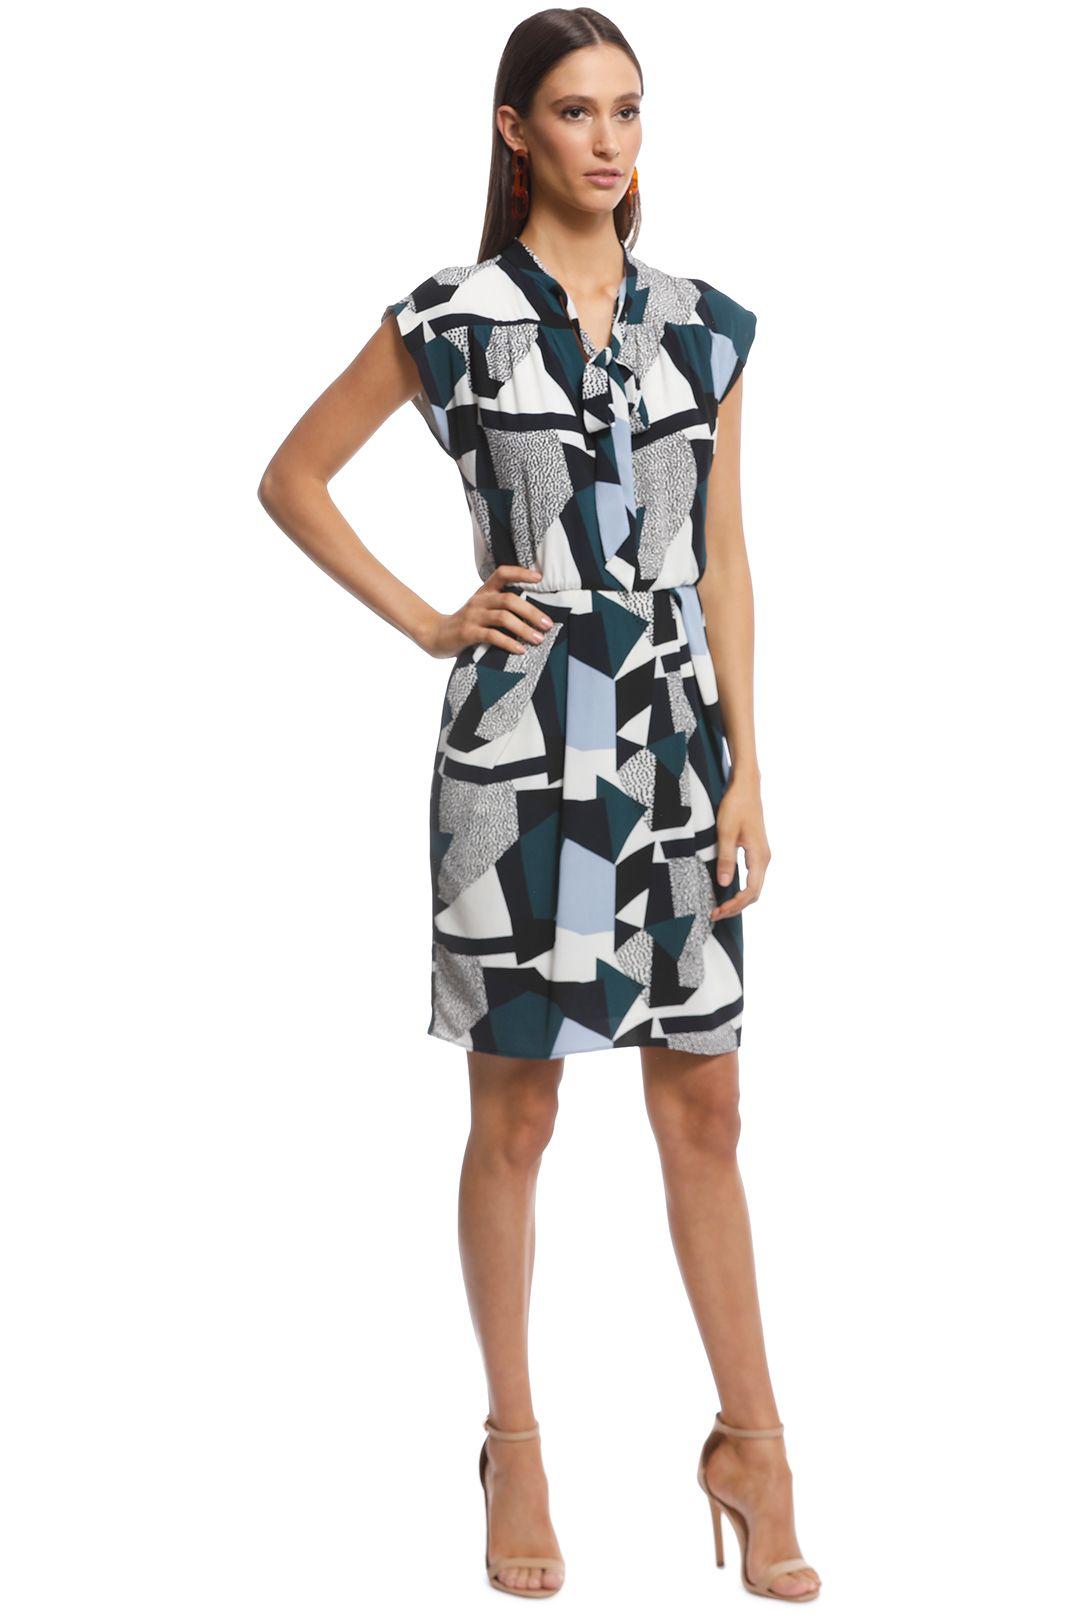 Cue - Textured Geo Spot Dress - Multi - Side